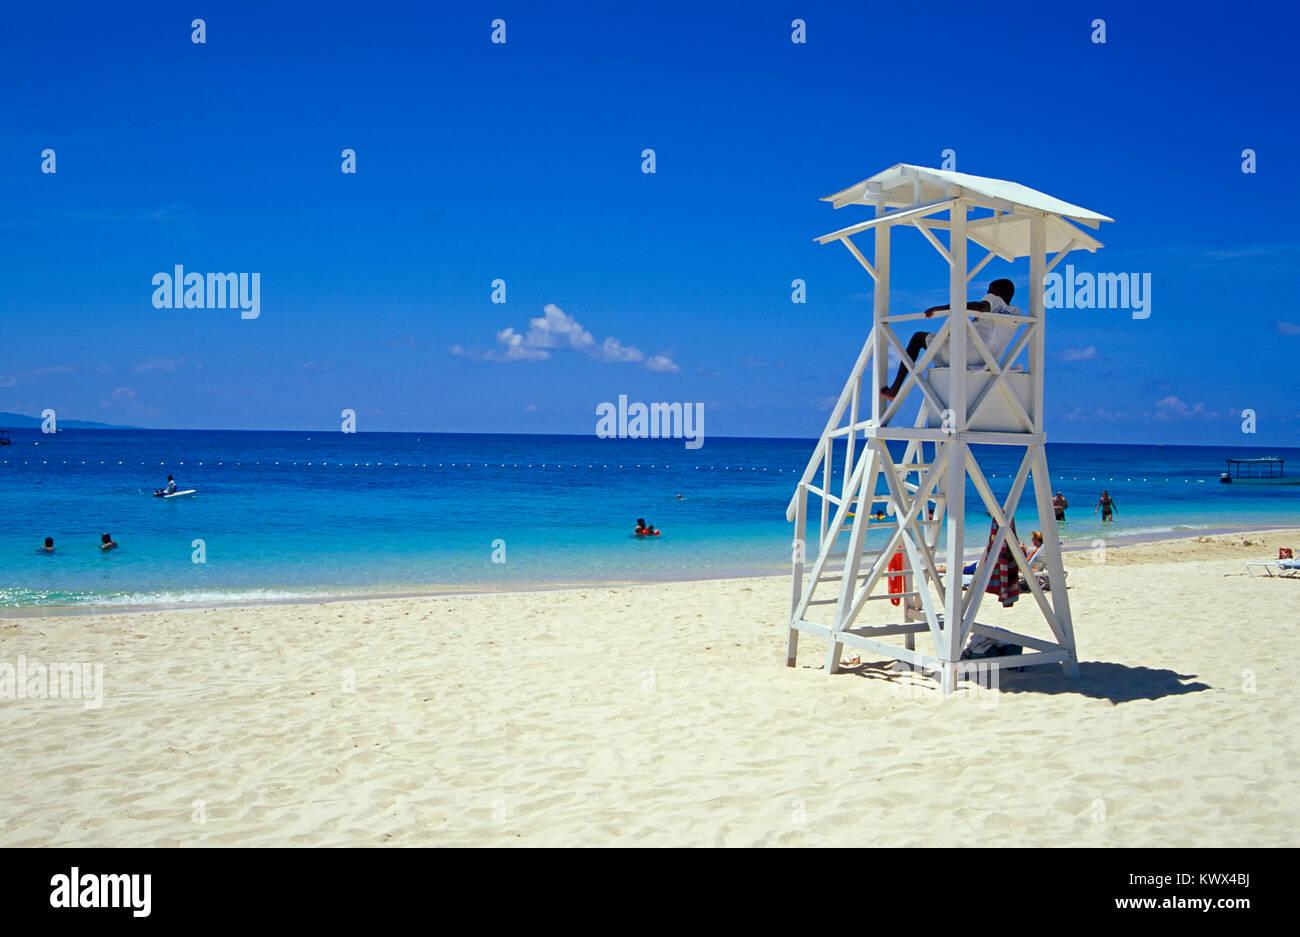 Doctors Cave Beach, Montego Bay, Jamaica - Stock Image